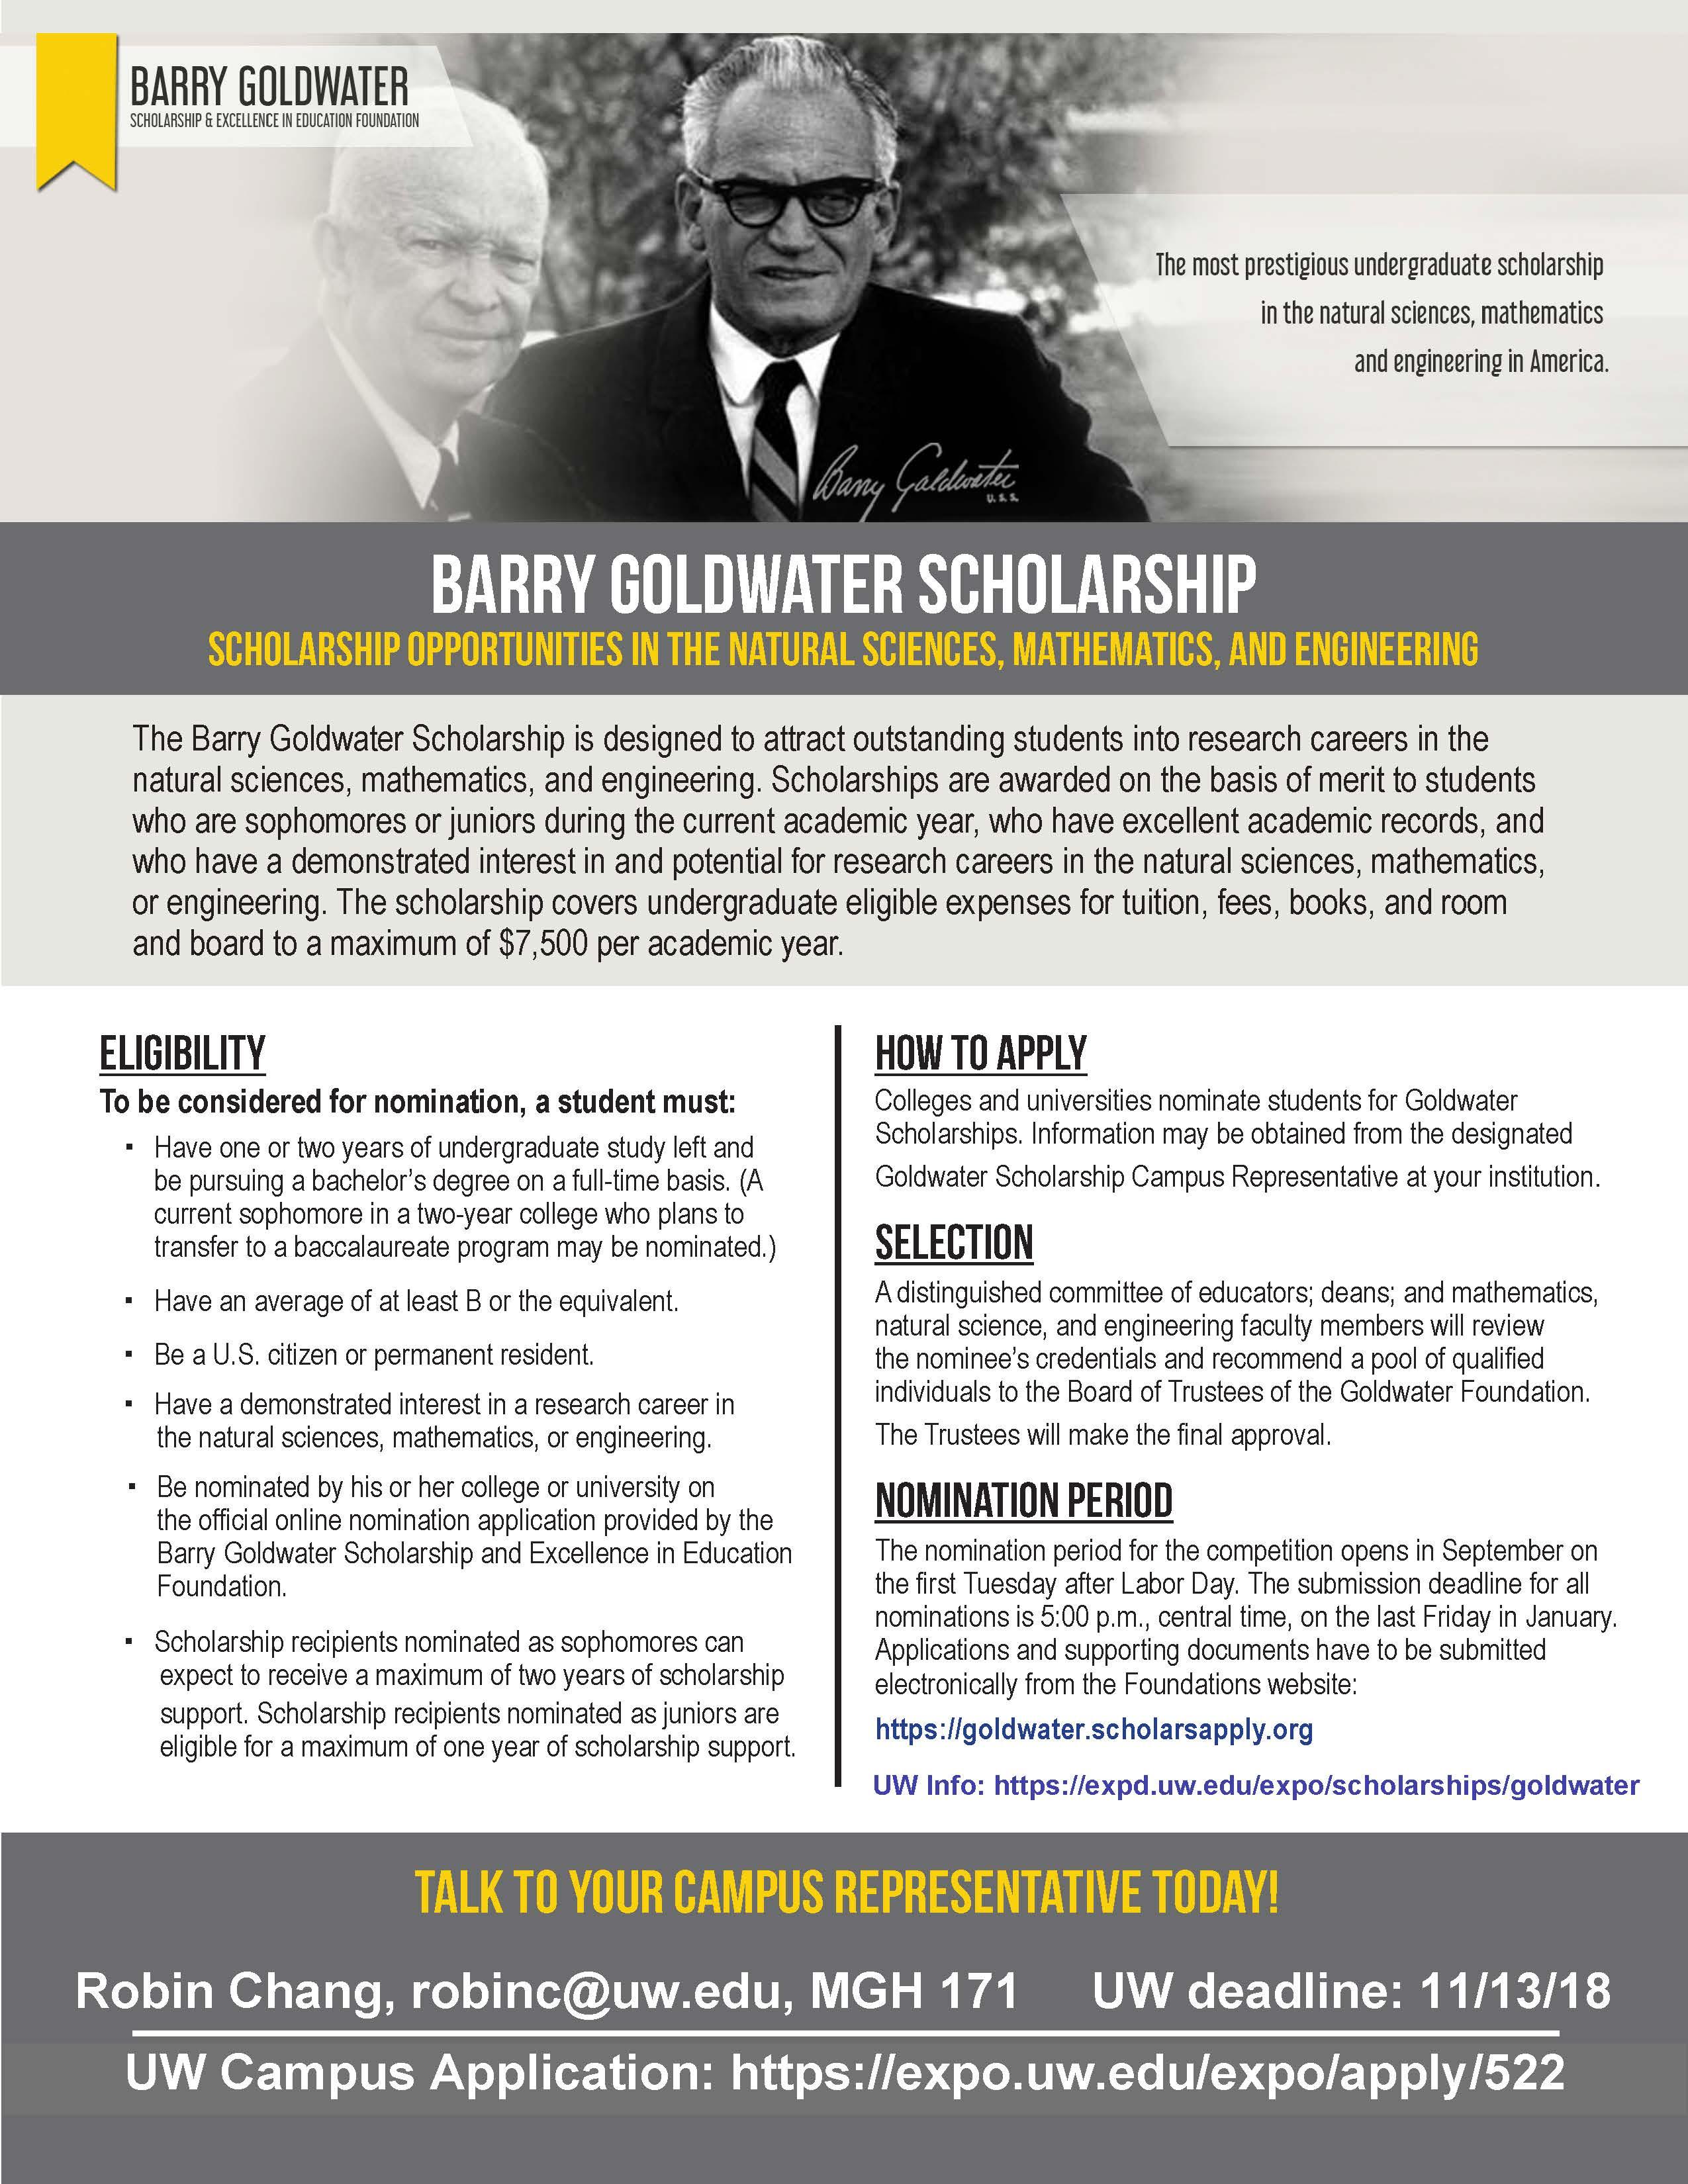 2019 Goldwater flyer.jpg